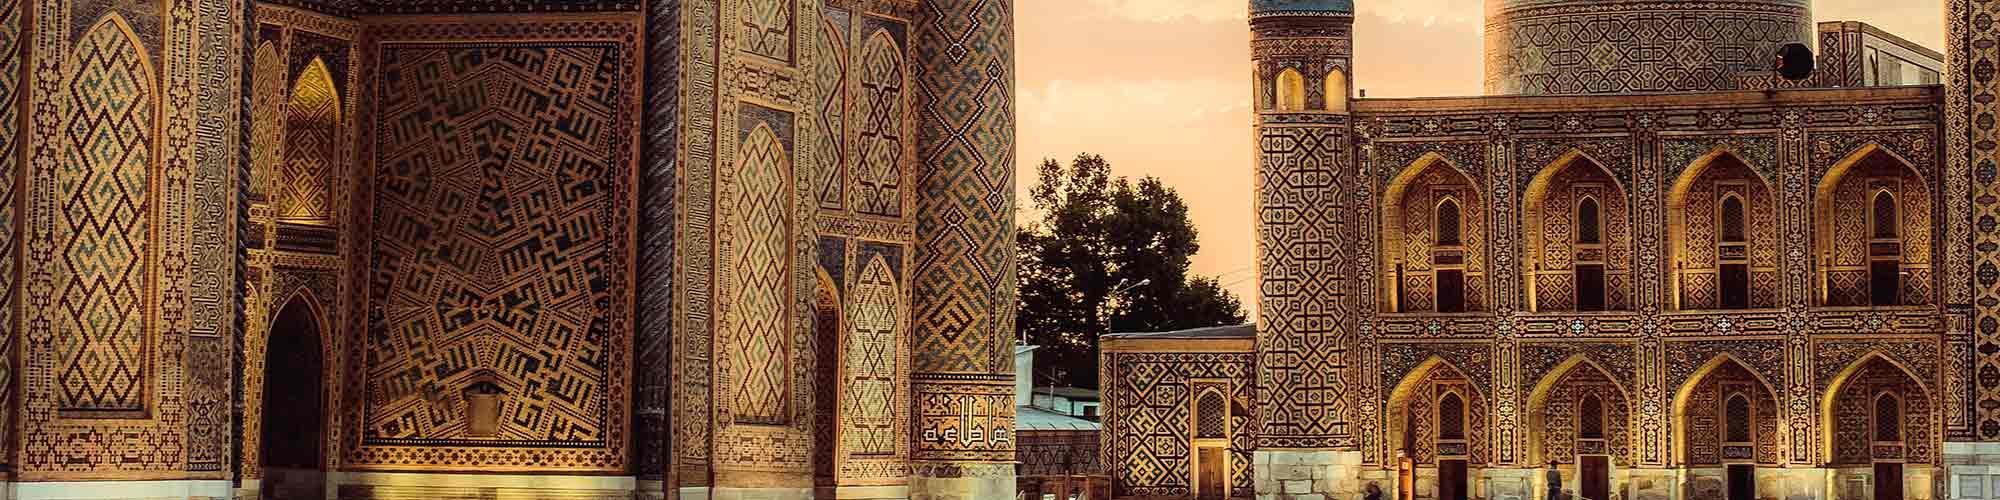 La gran ruta de la seda por Kirguistán y Uzbekistán - EL PAÍS Viajes